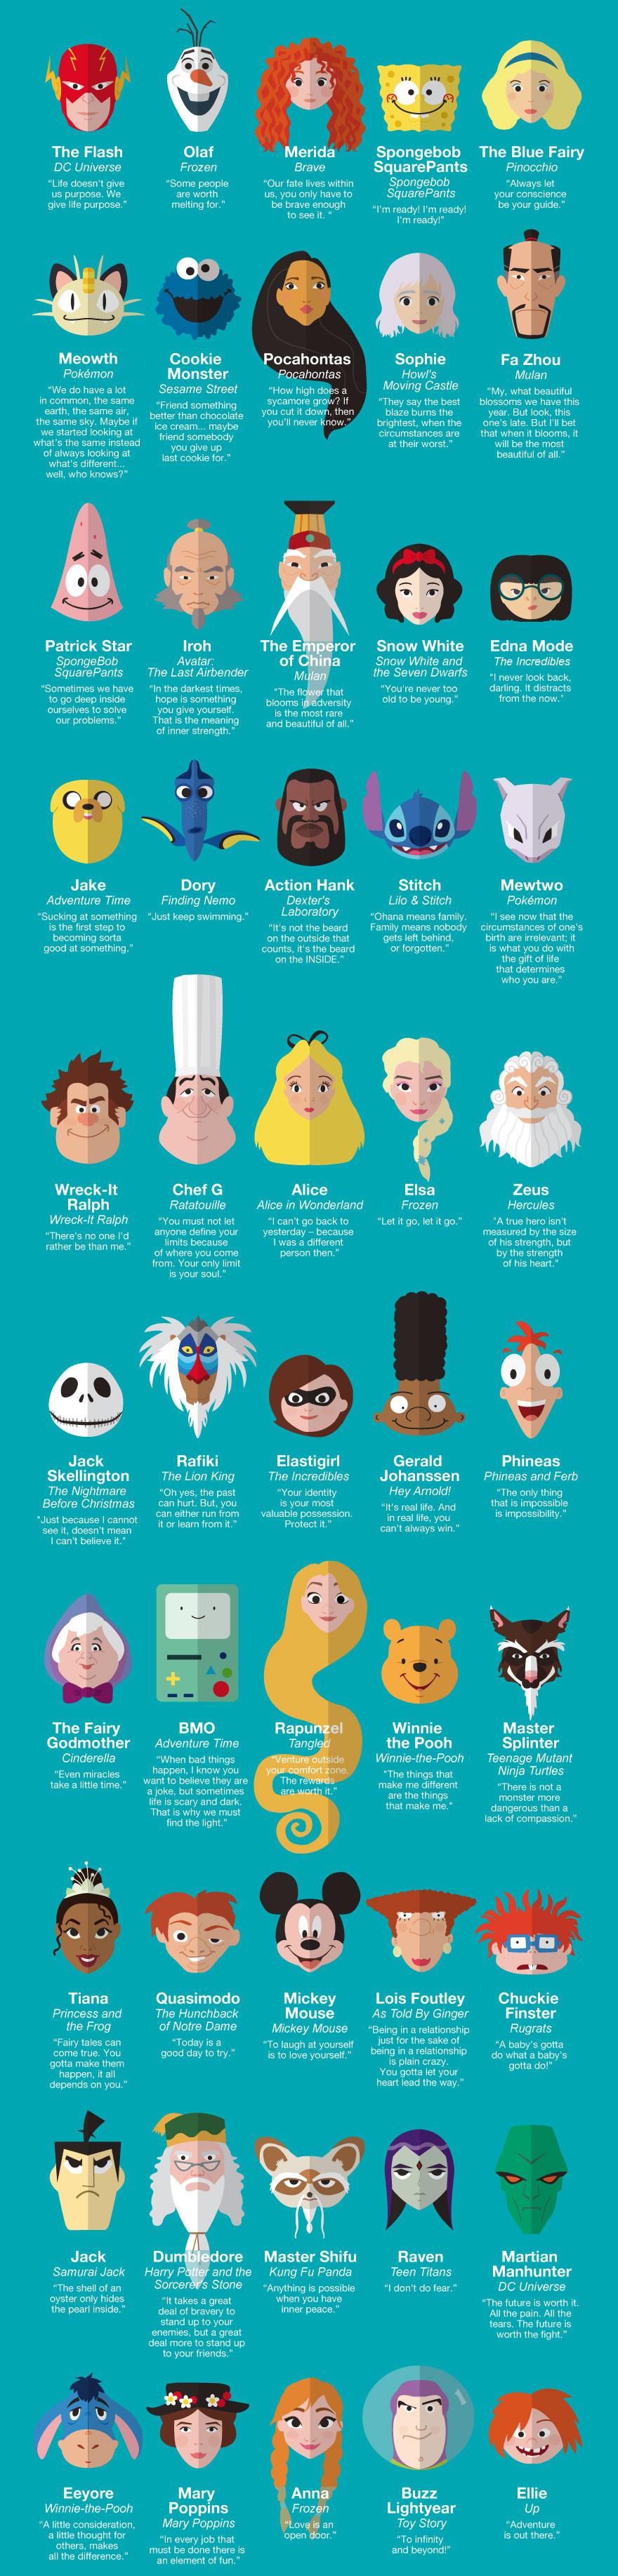 favorite-cartoon-character-life-advice-kids-entertainment-aaa-state-play-1